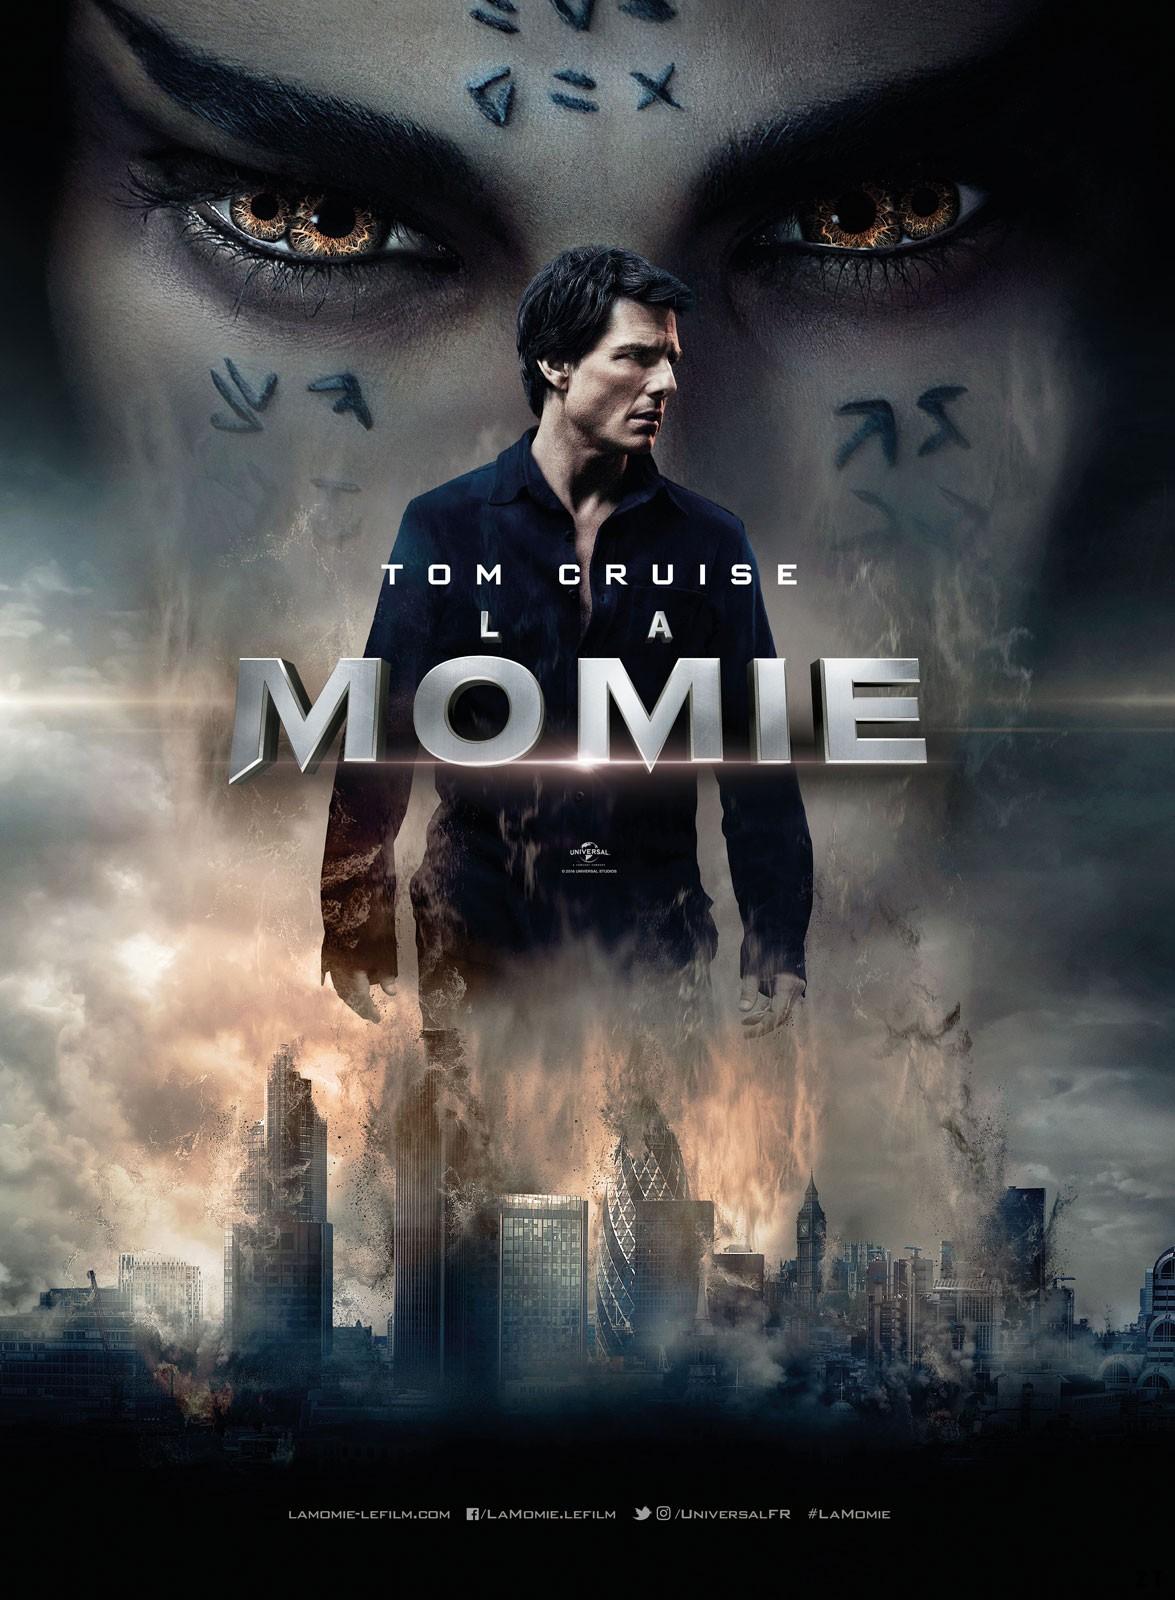 La Momie FRENCH BluRay 1080p 2017